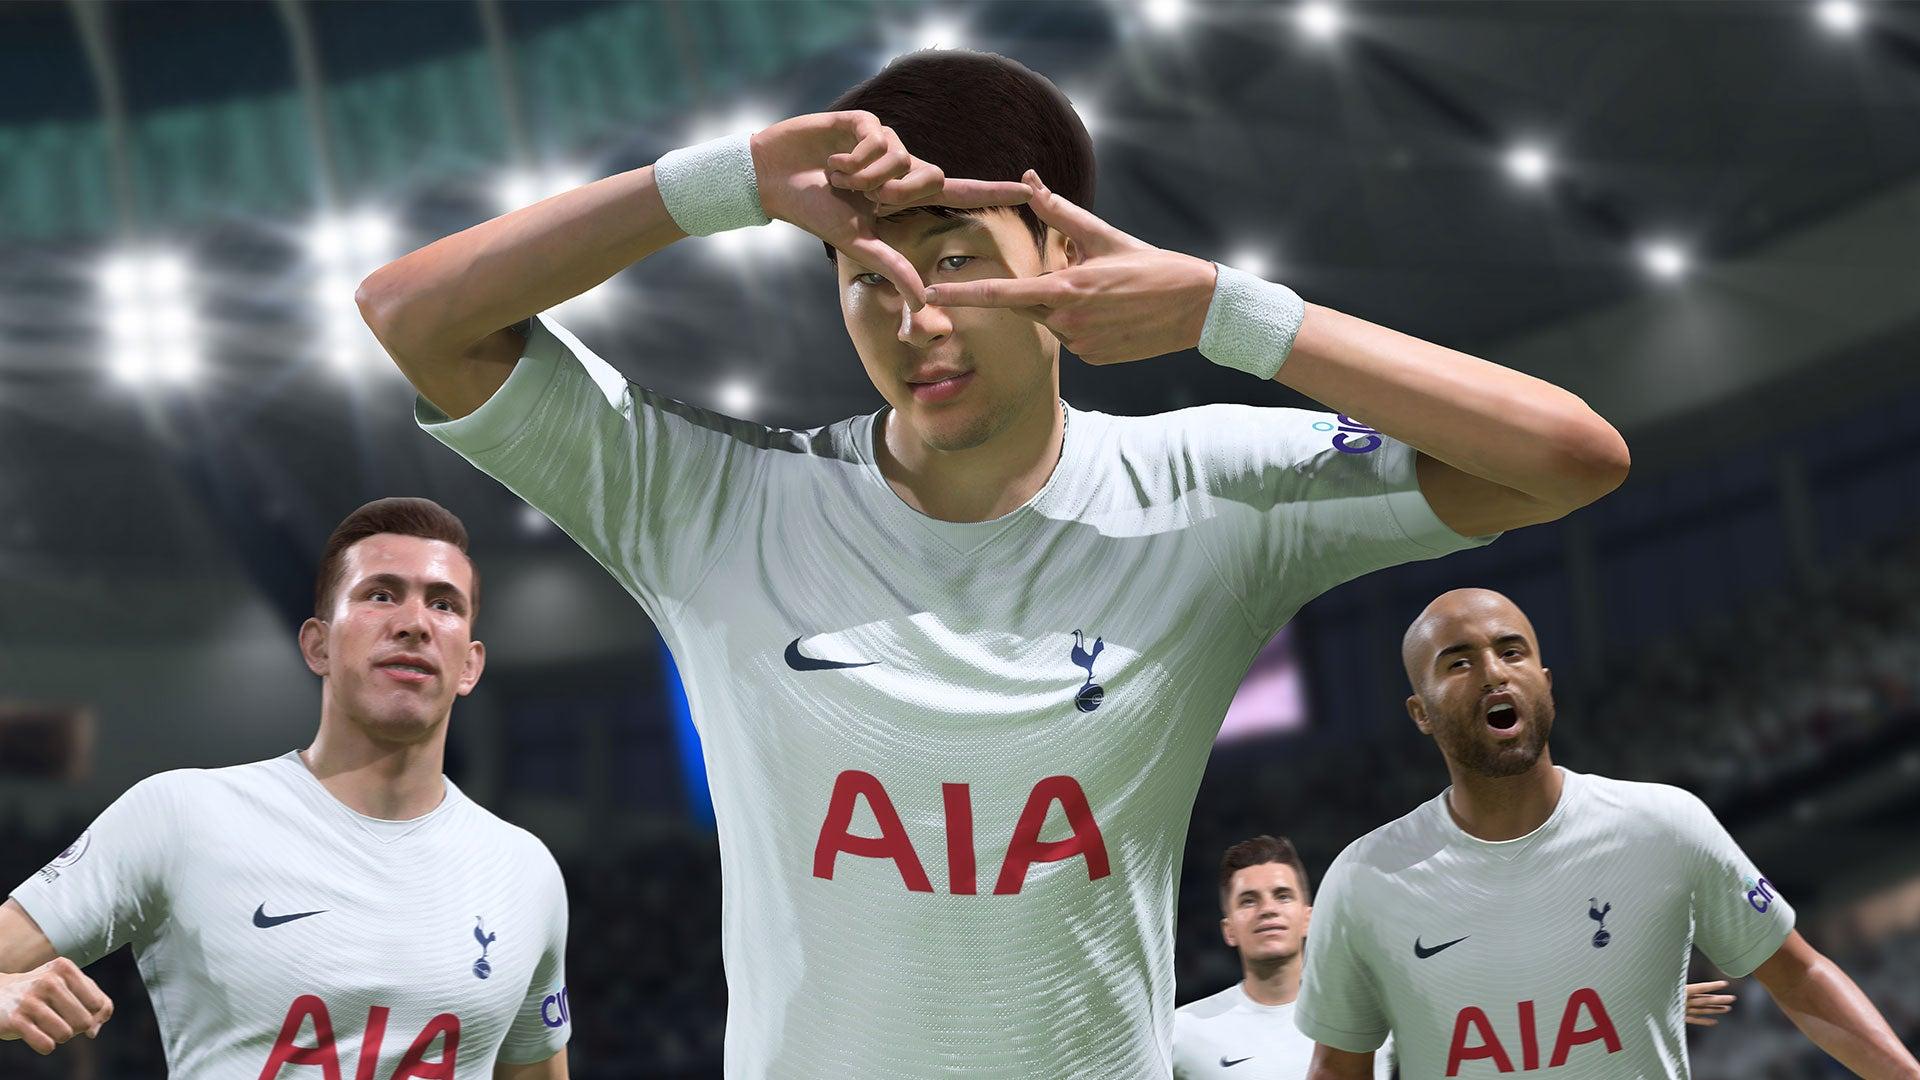 FIFA 22 Walkout